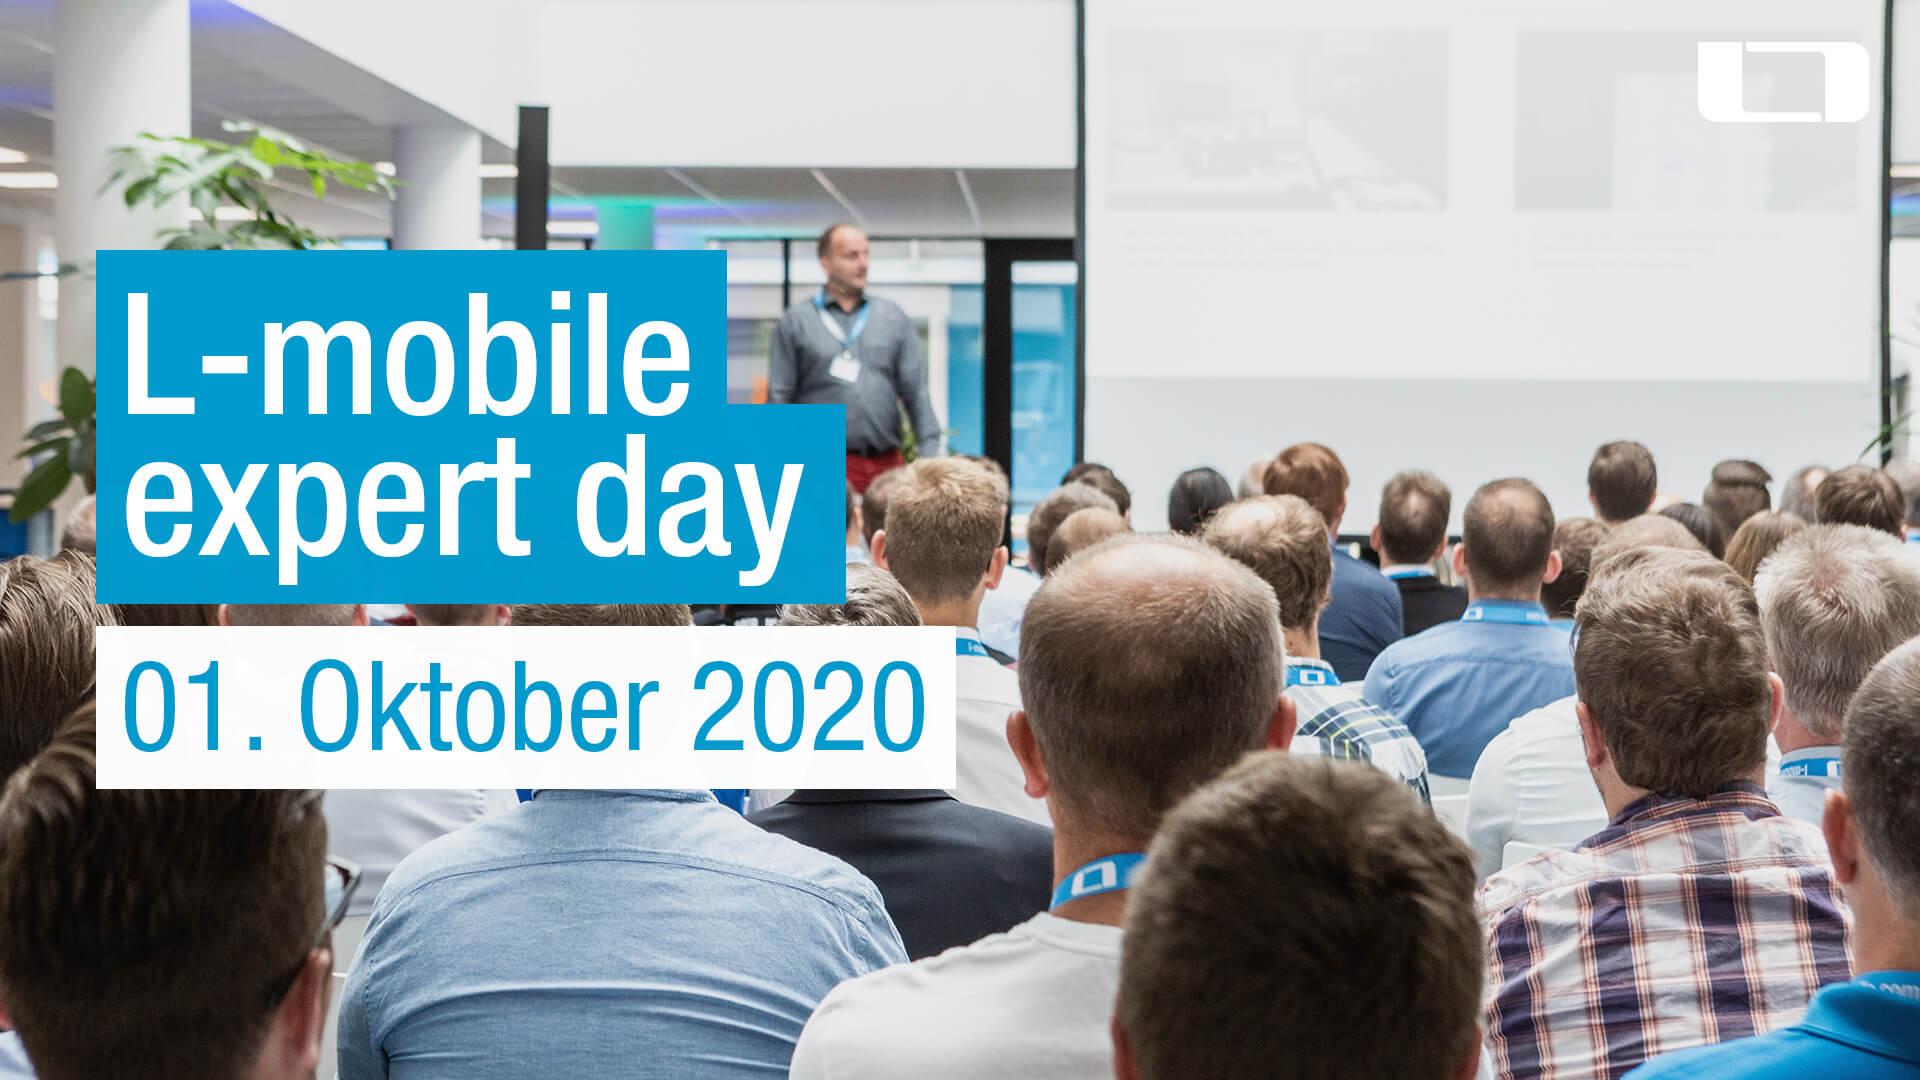 L-mobile expert day | Expertentag Handel und Industrie20